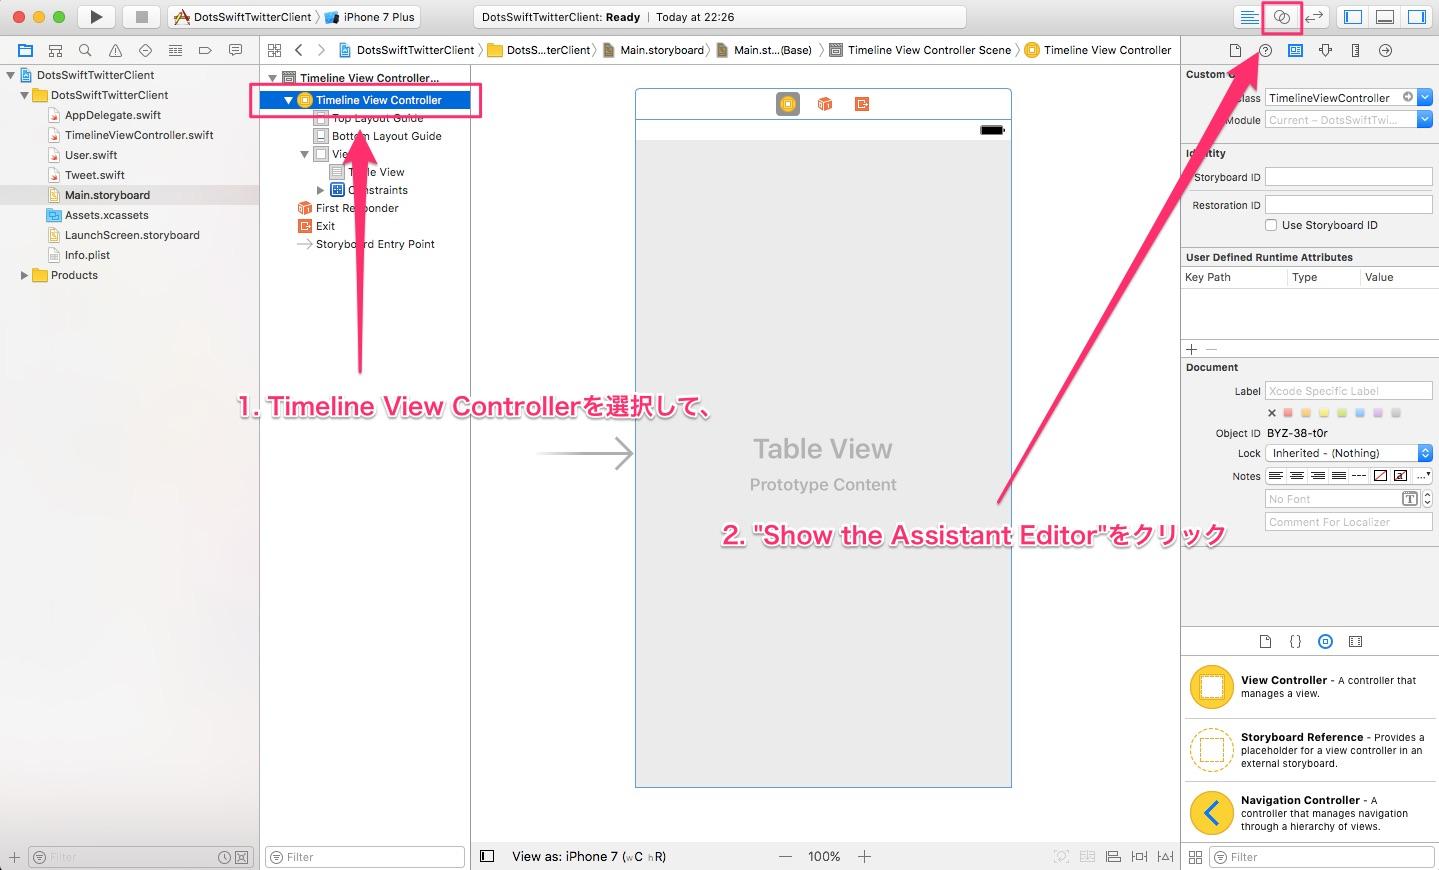 assistanteditor.jpg